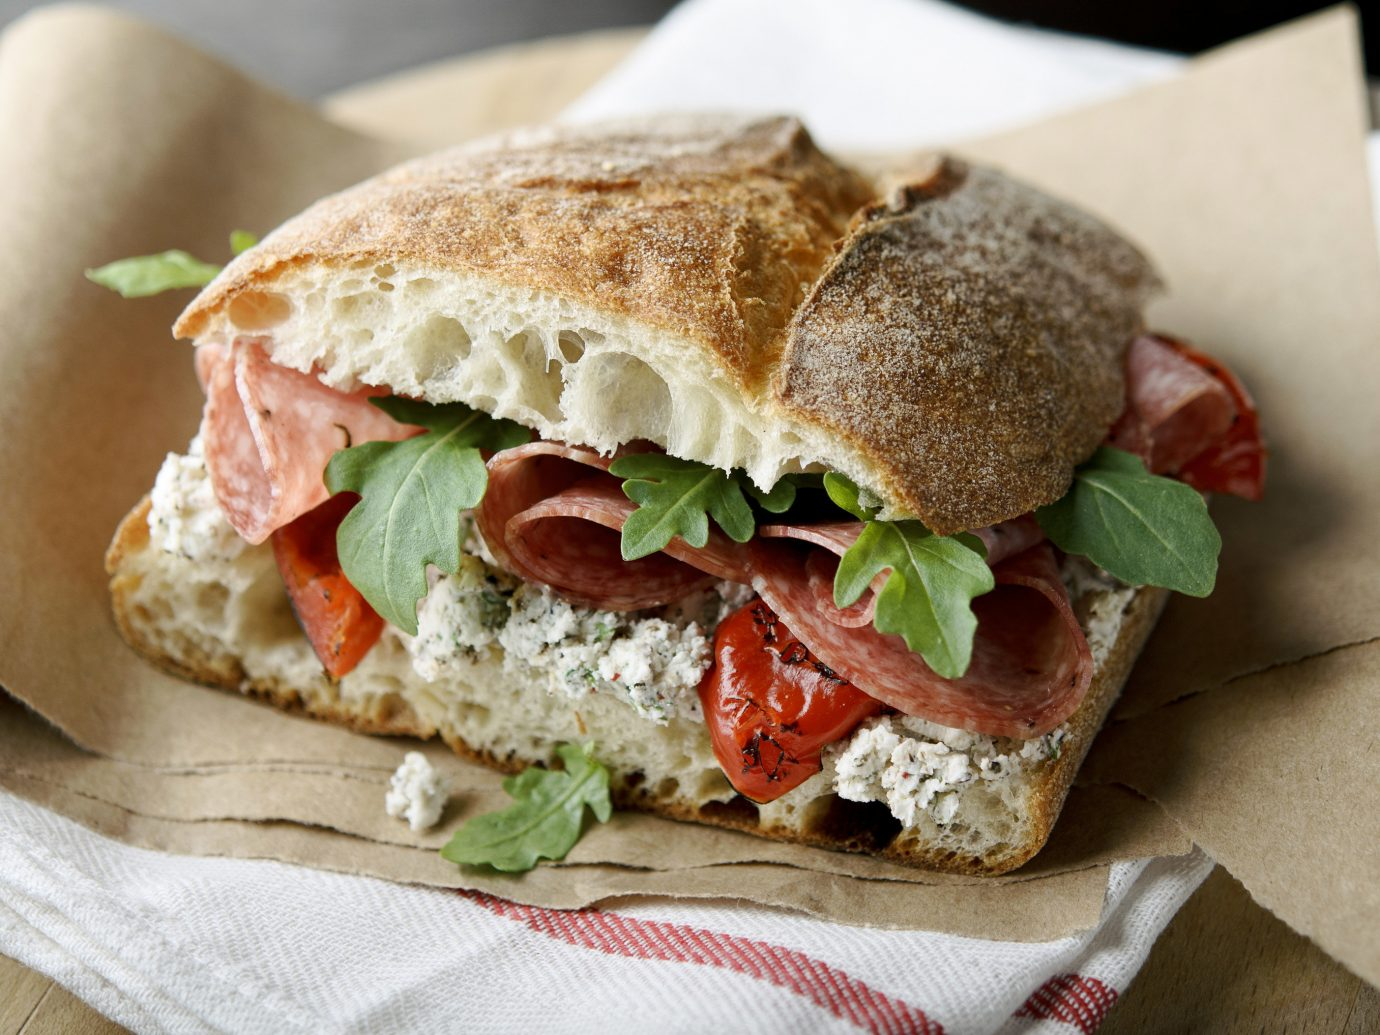 Food + Drink food sandwich paper snack food dish muffuletta blt submarine sandwich cuisine produce meat meal lunch ciabatta half